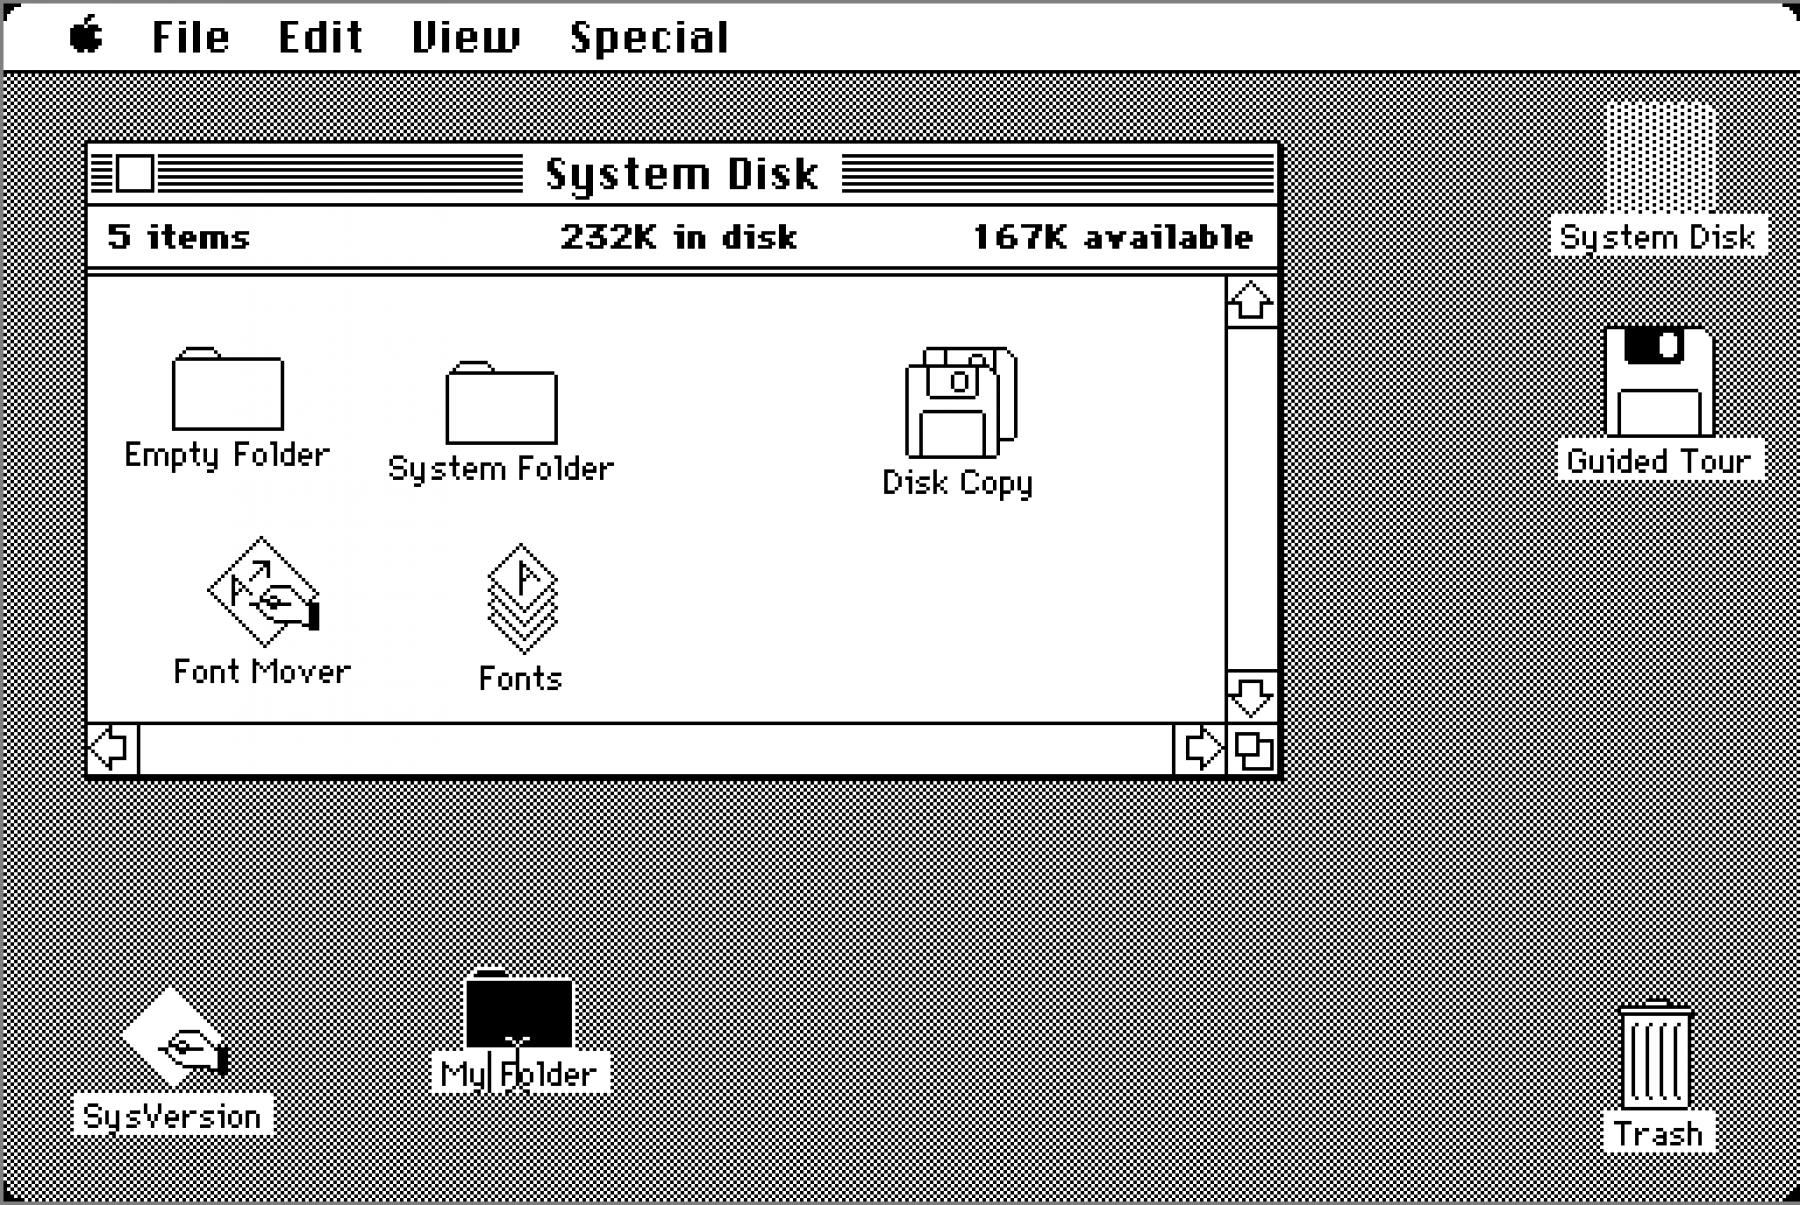 Macintosh-user-interface-1984